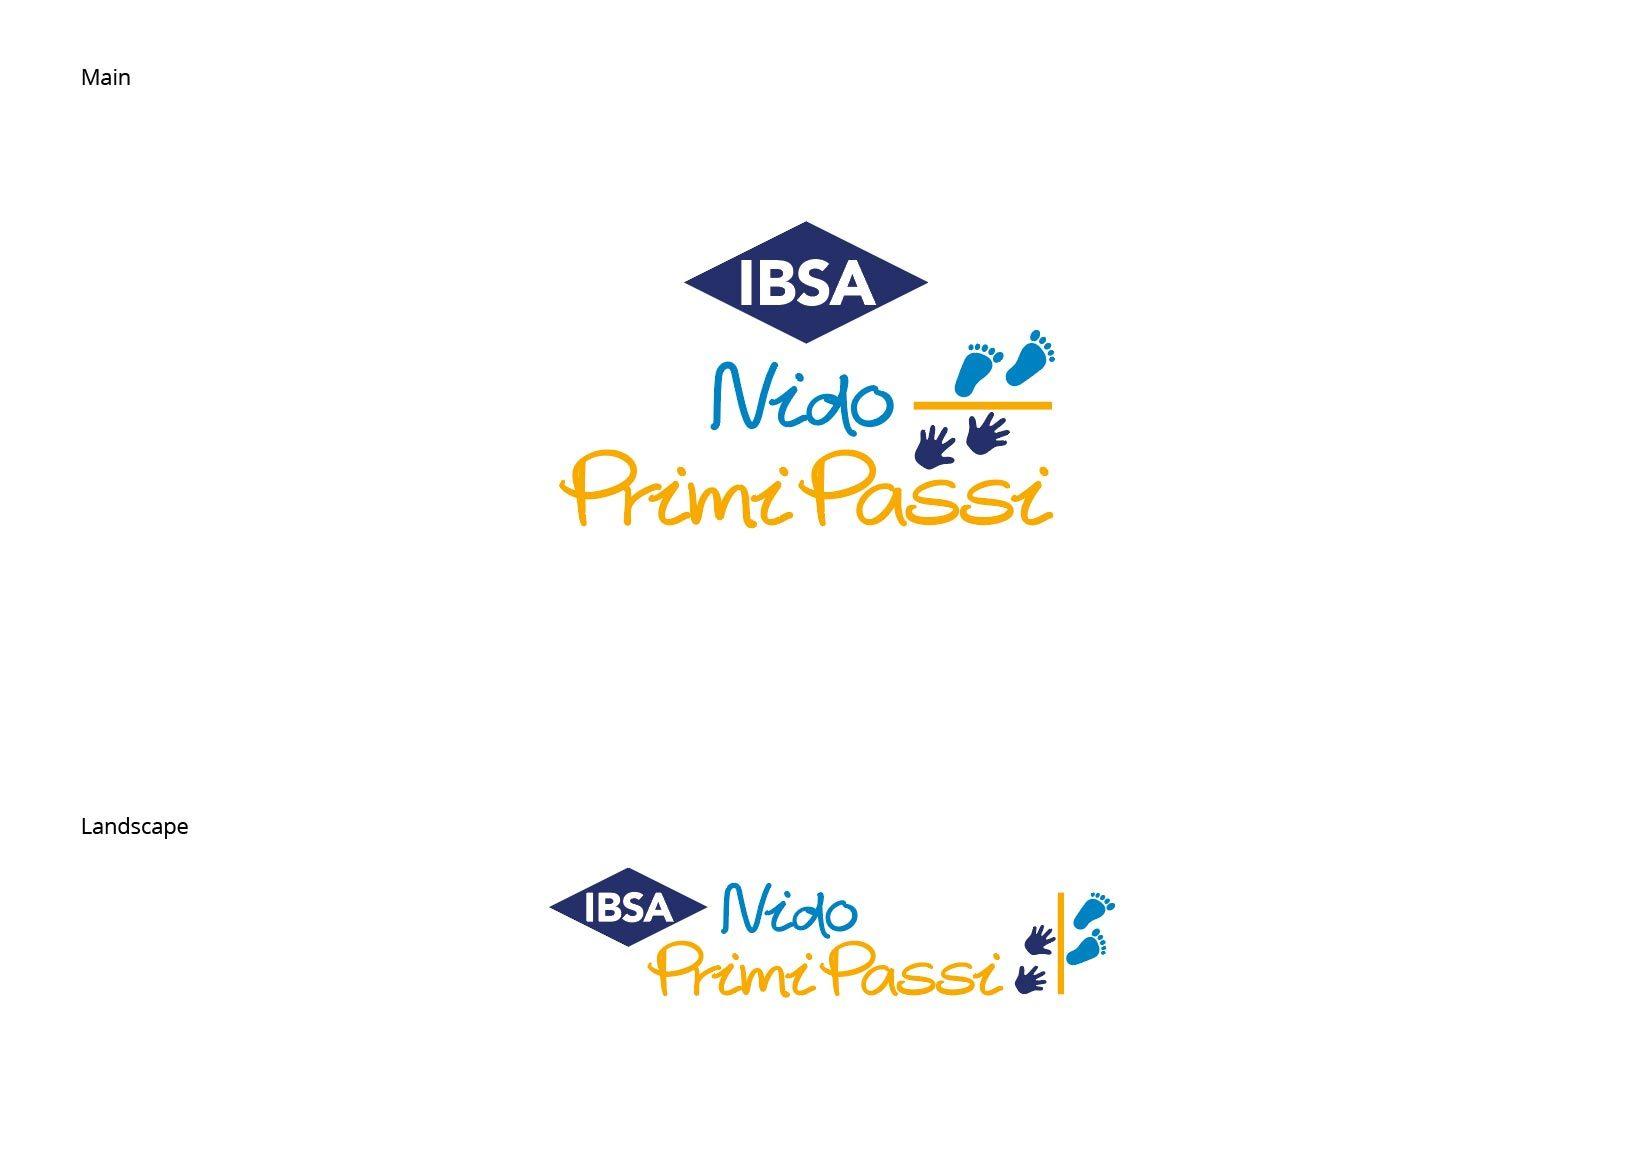 IBSA Nido Primi Passi logo